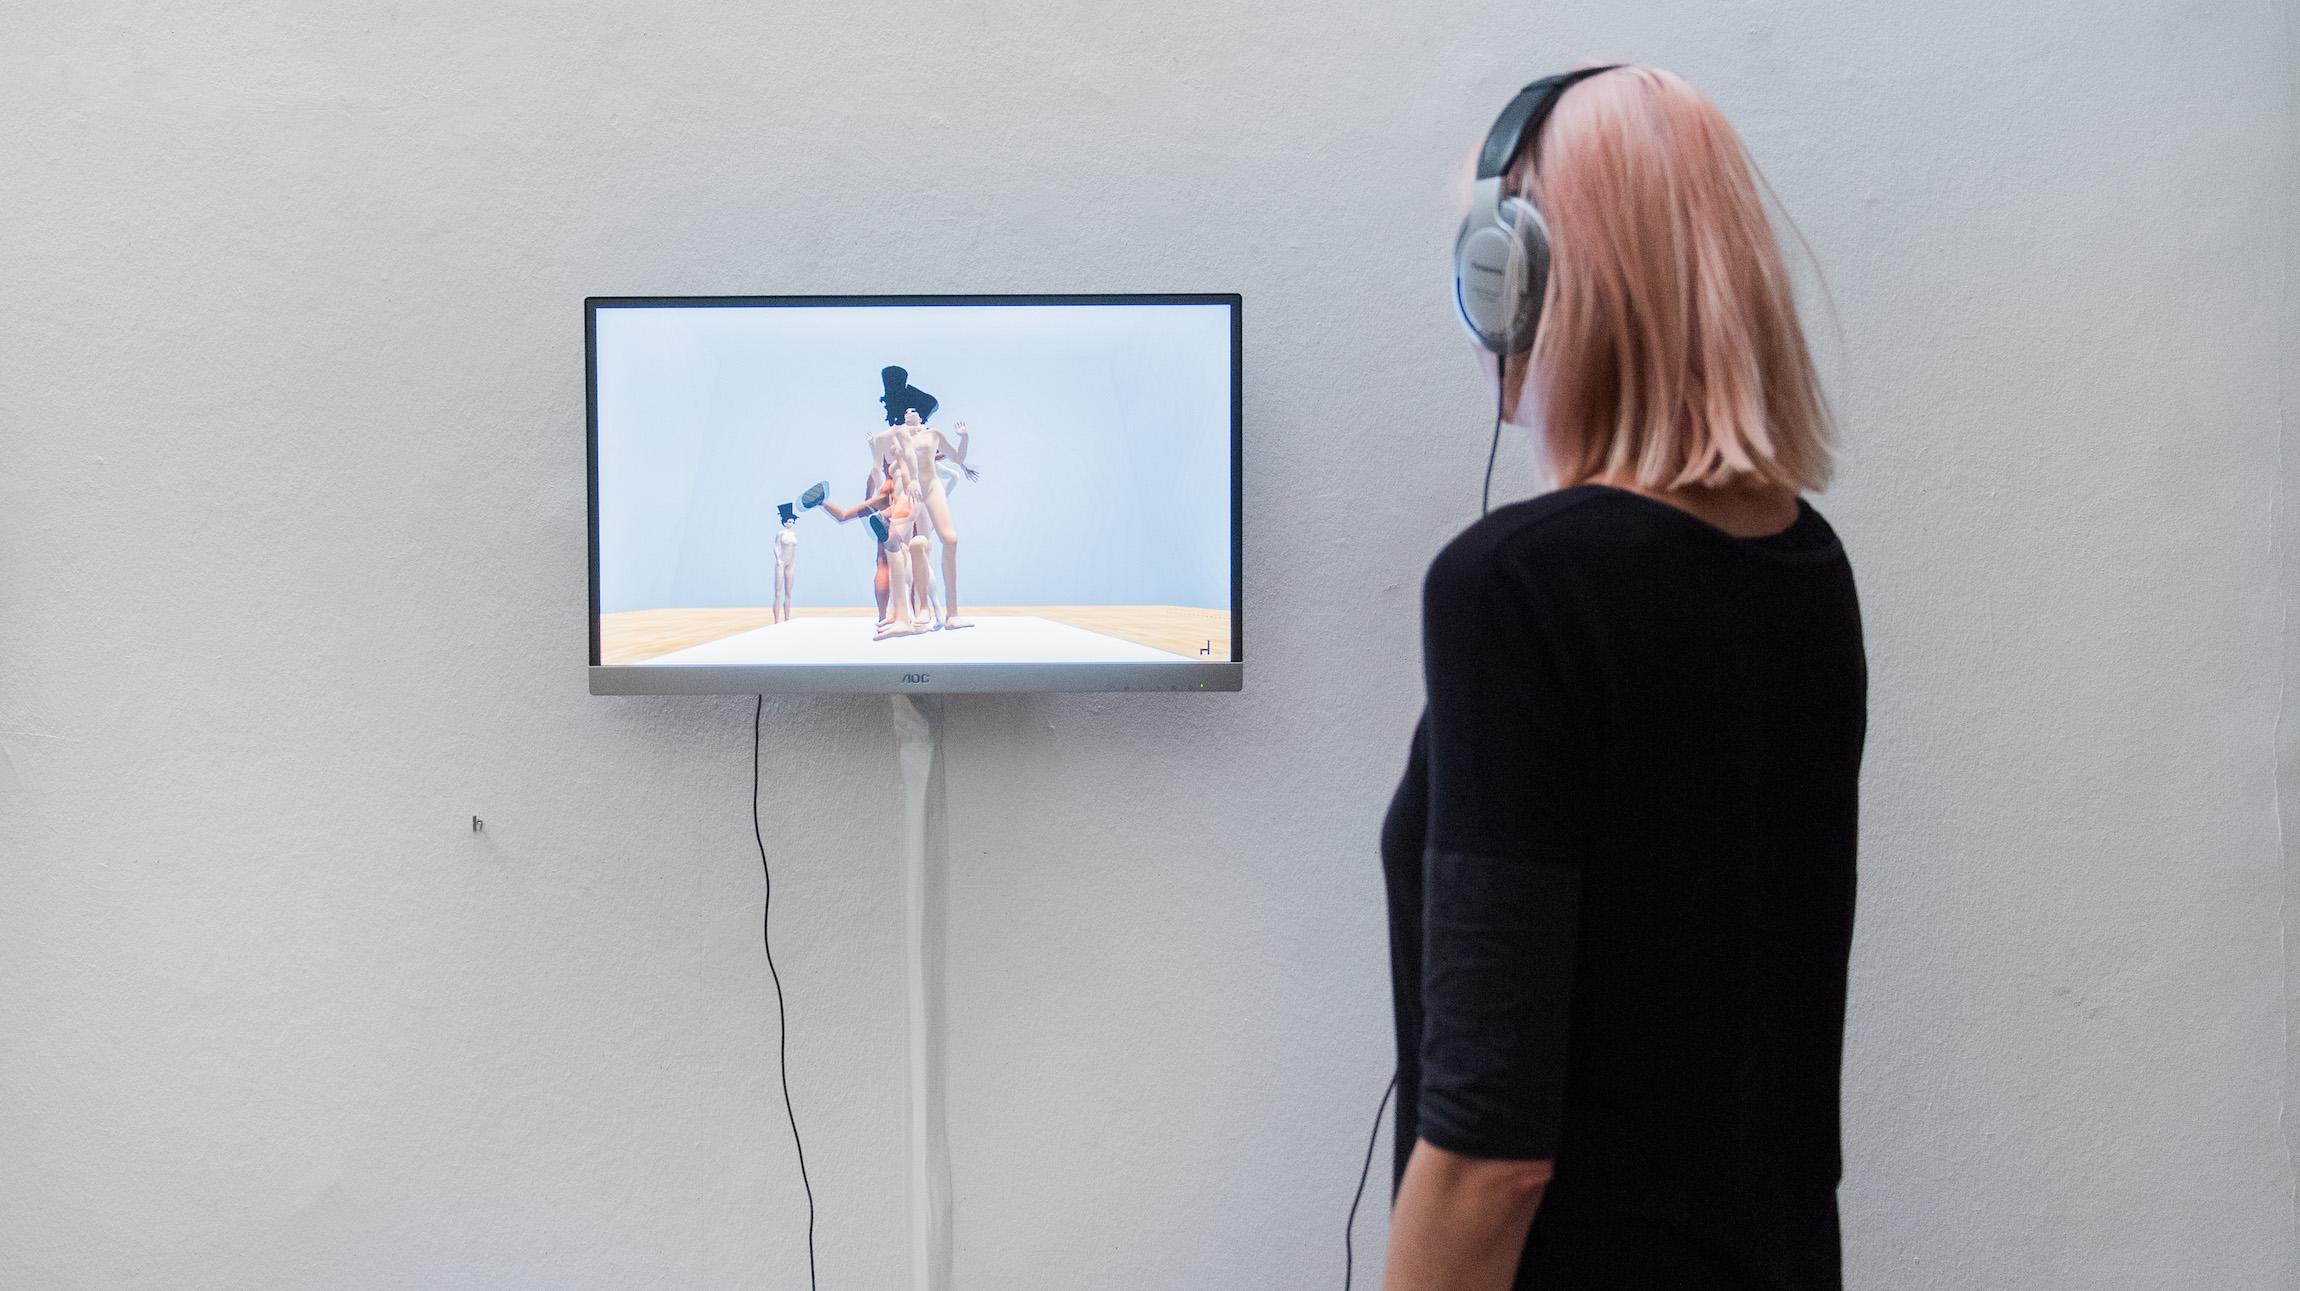 Exhibition view RESET III AND VIRTUAL REALITY, photo by Nathan Ishar / Artwork by Gazira Babeli